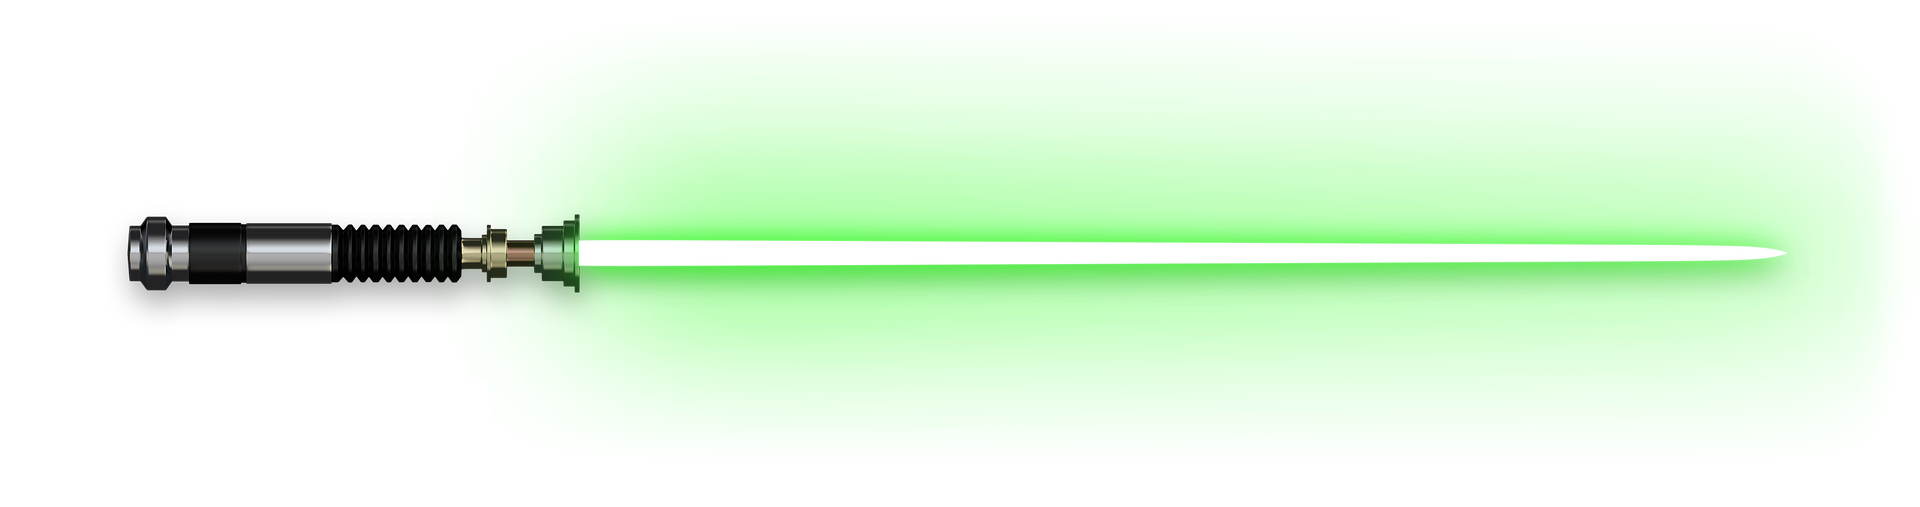 star-wars-2908144_1920.png